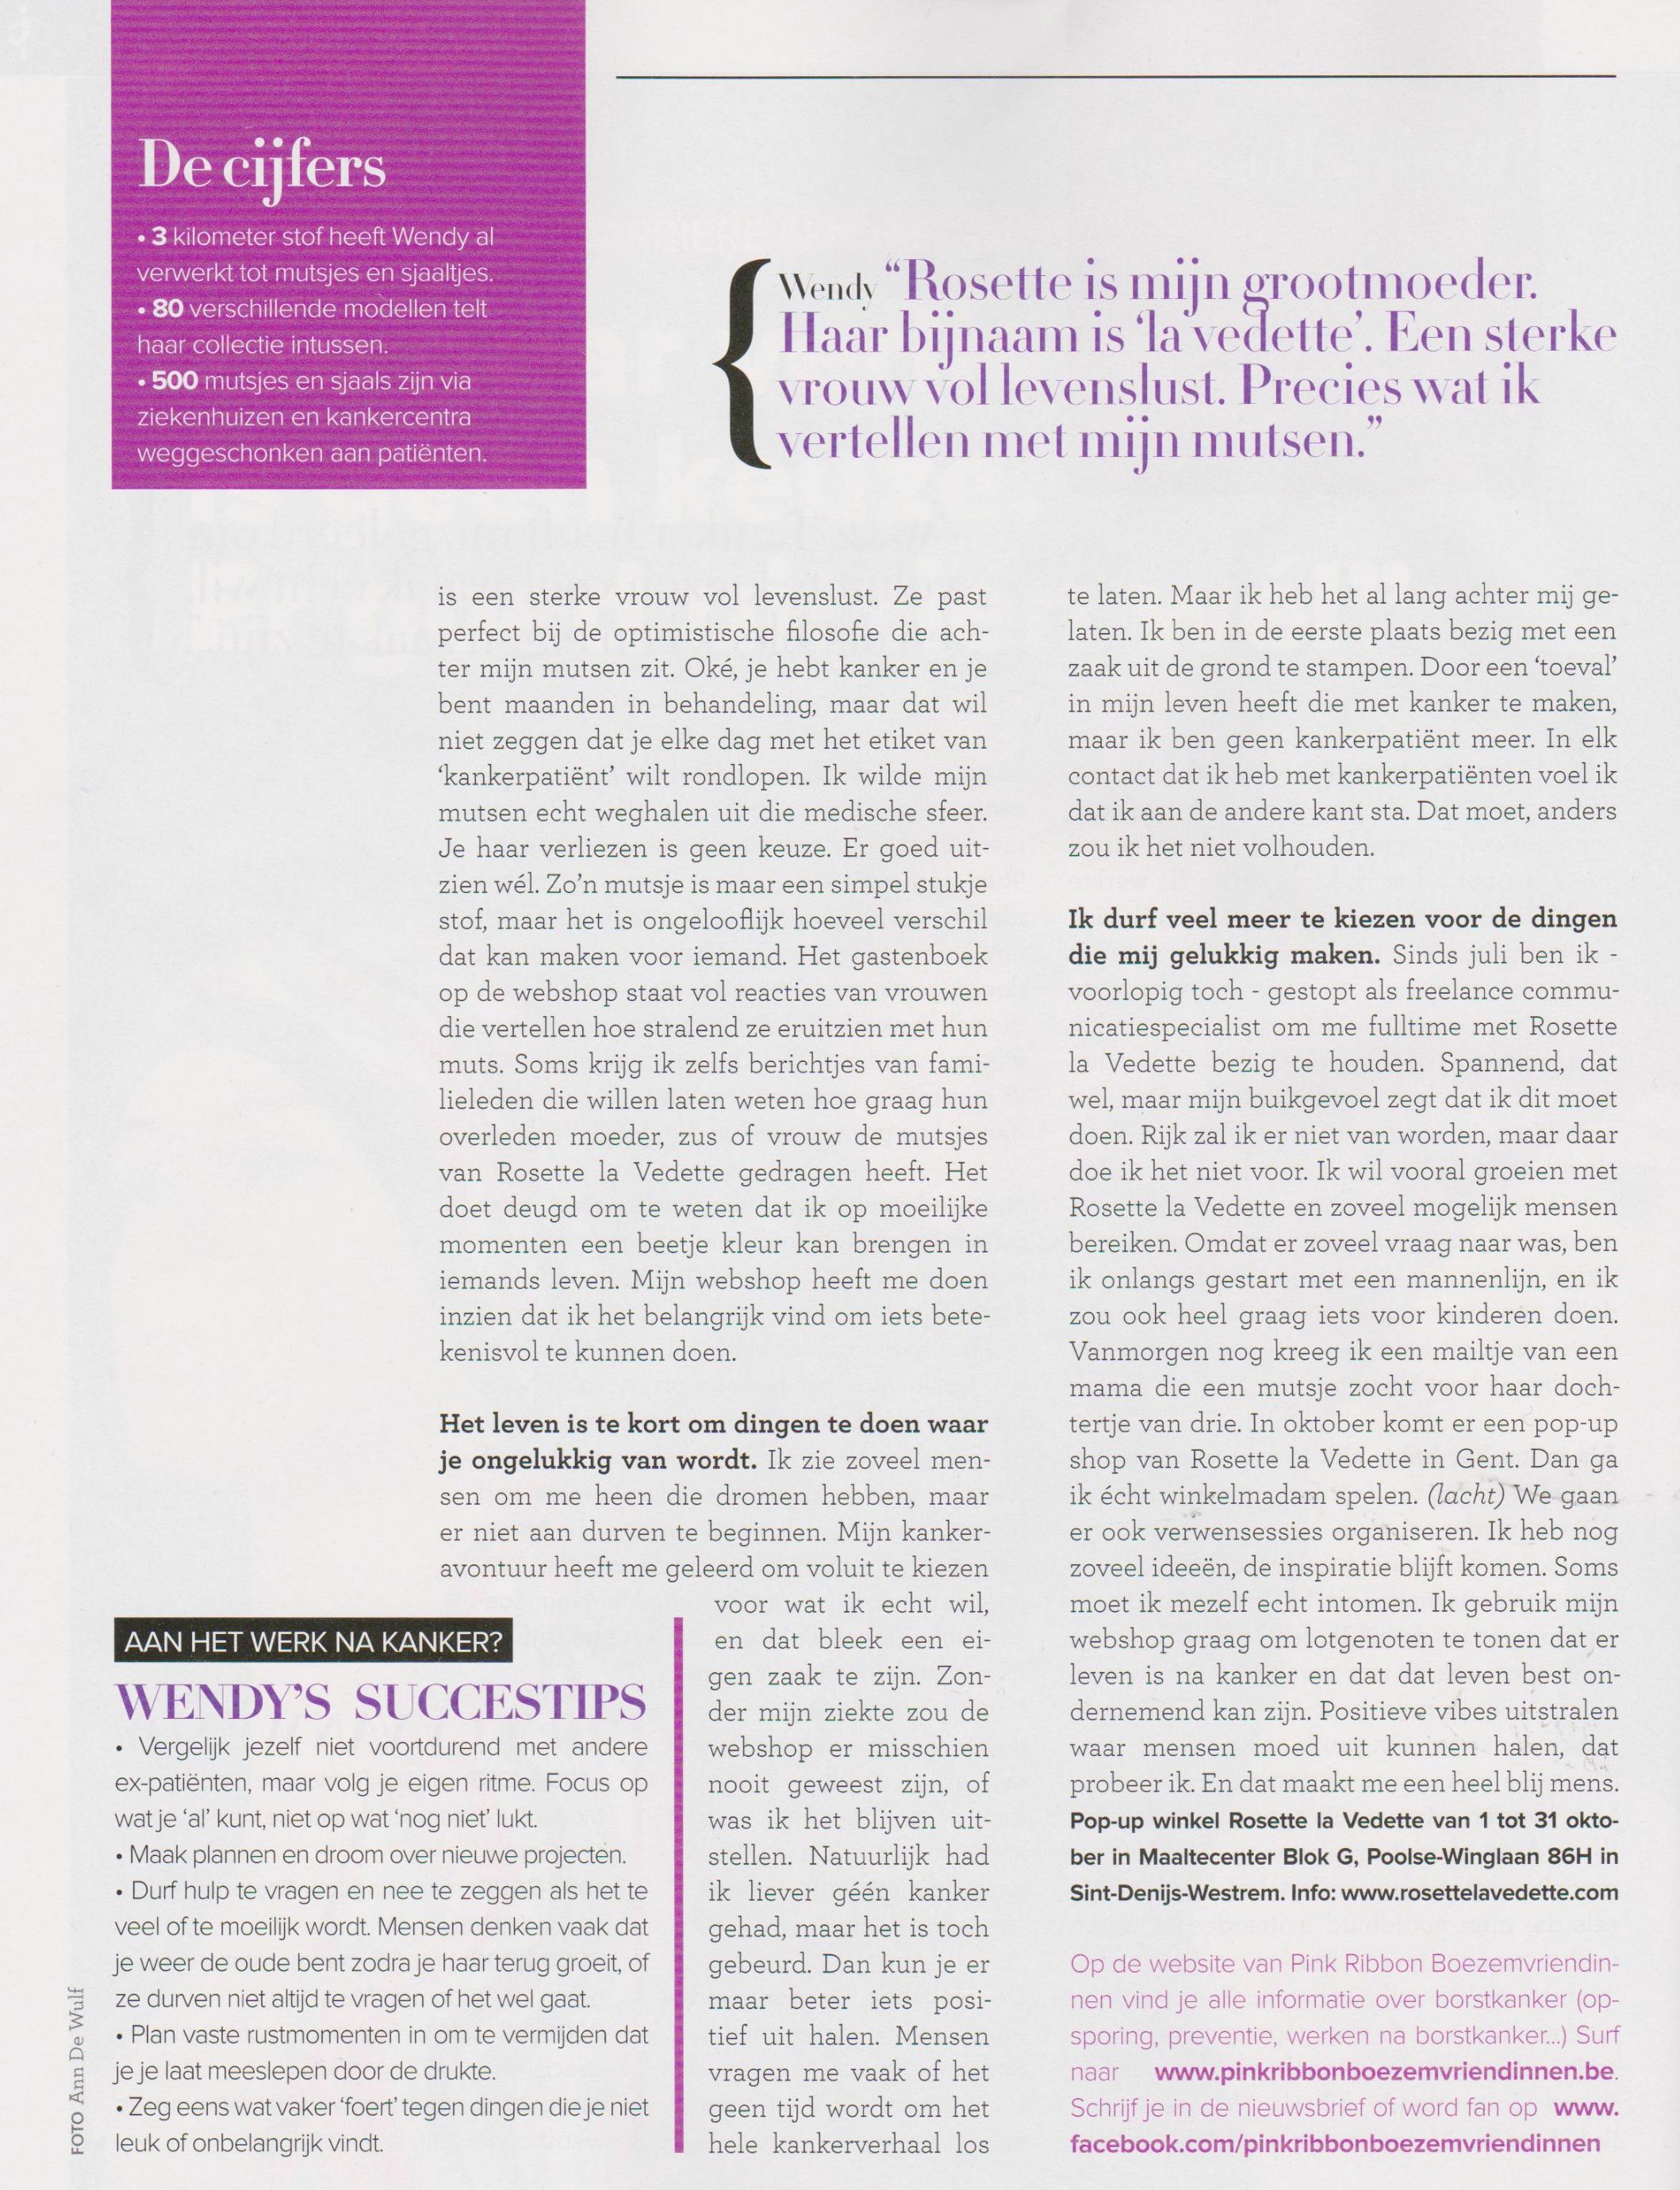 vitaya magazine Rosette la Vedette interview